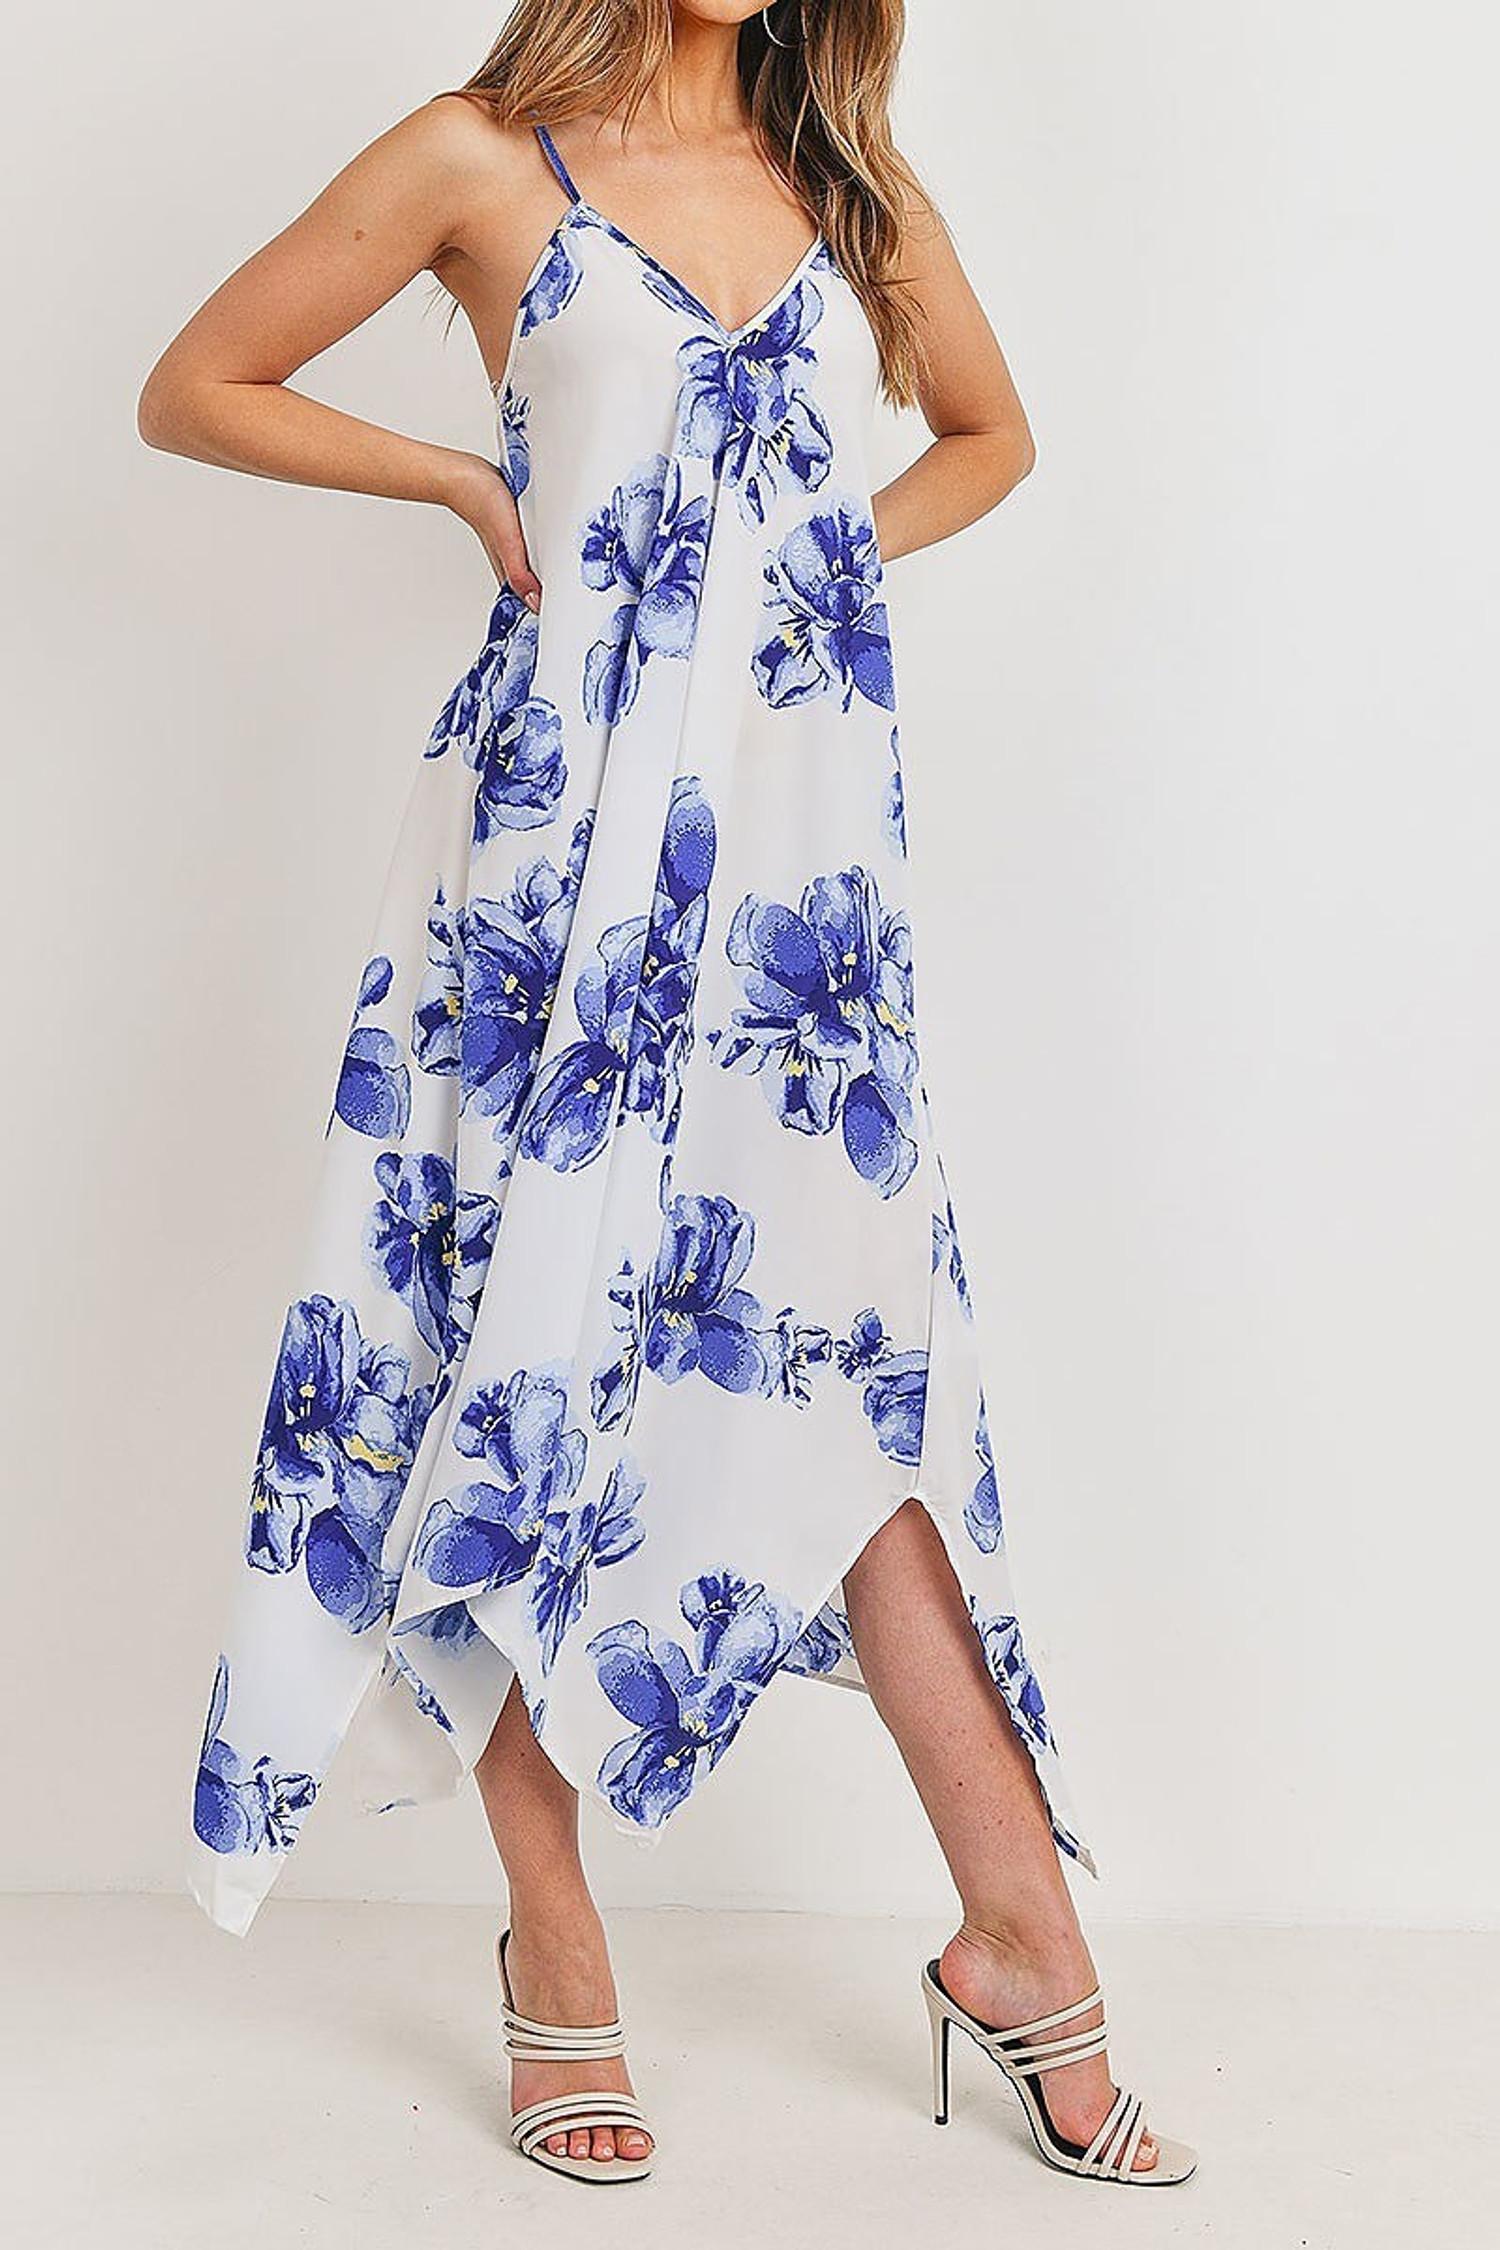 Blue Floral Tie Back Asymmetrical Hem Maxi Dress